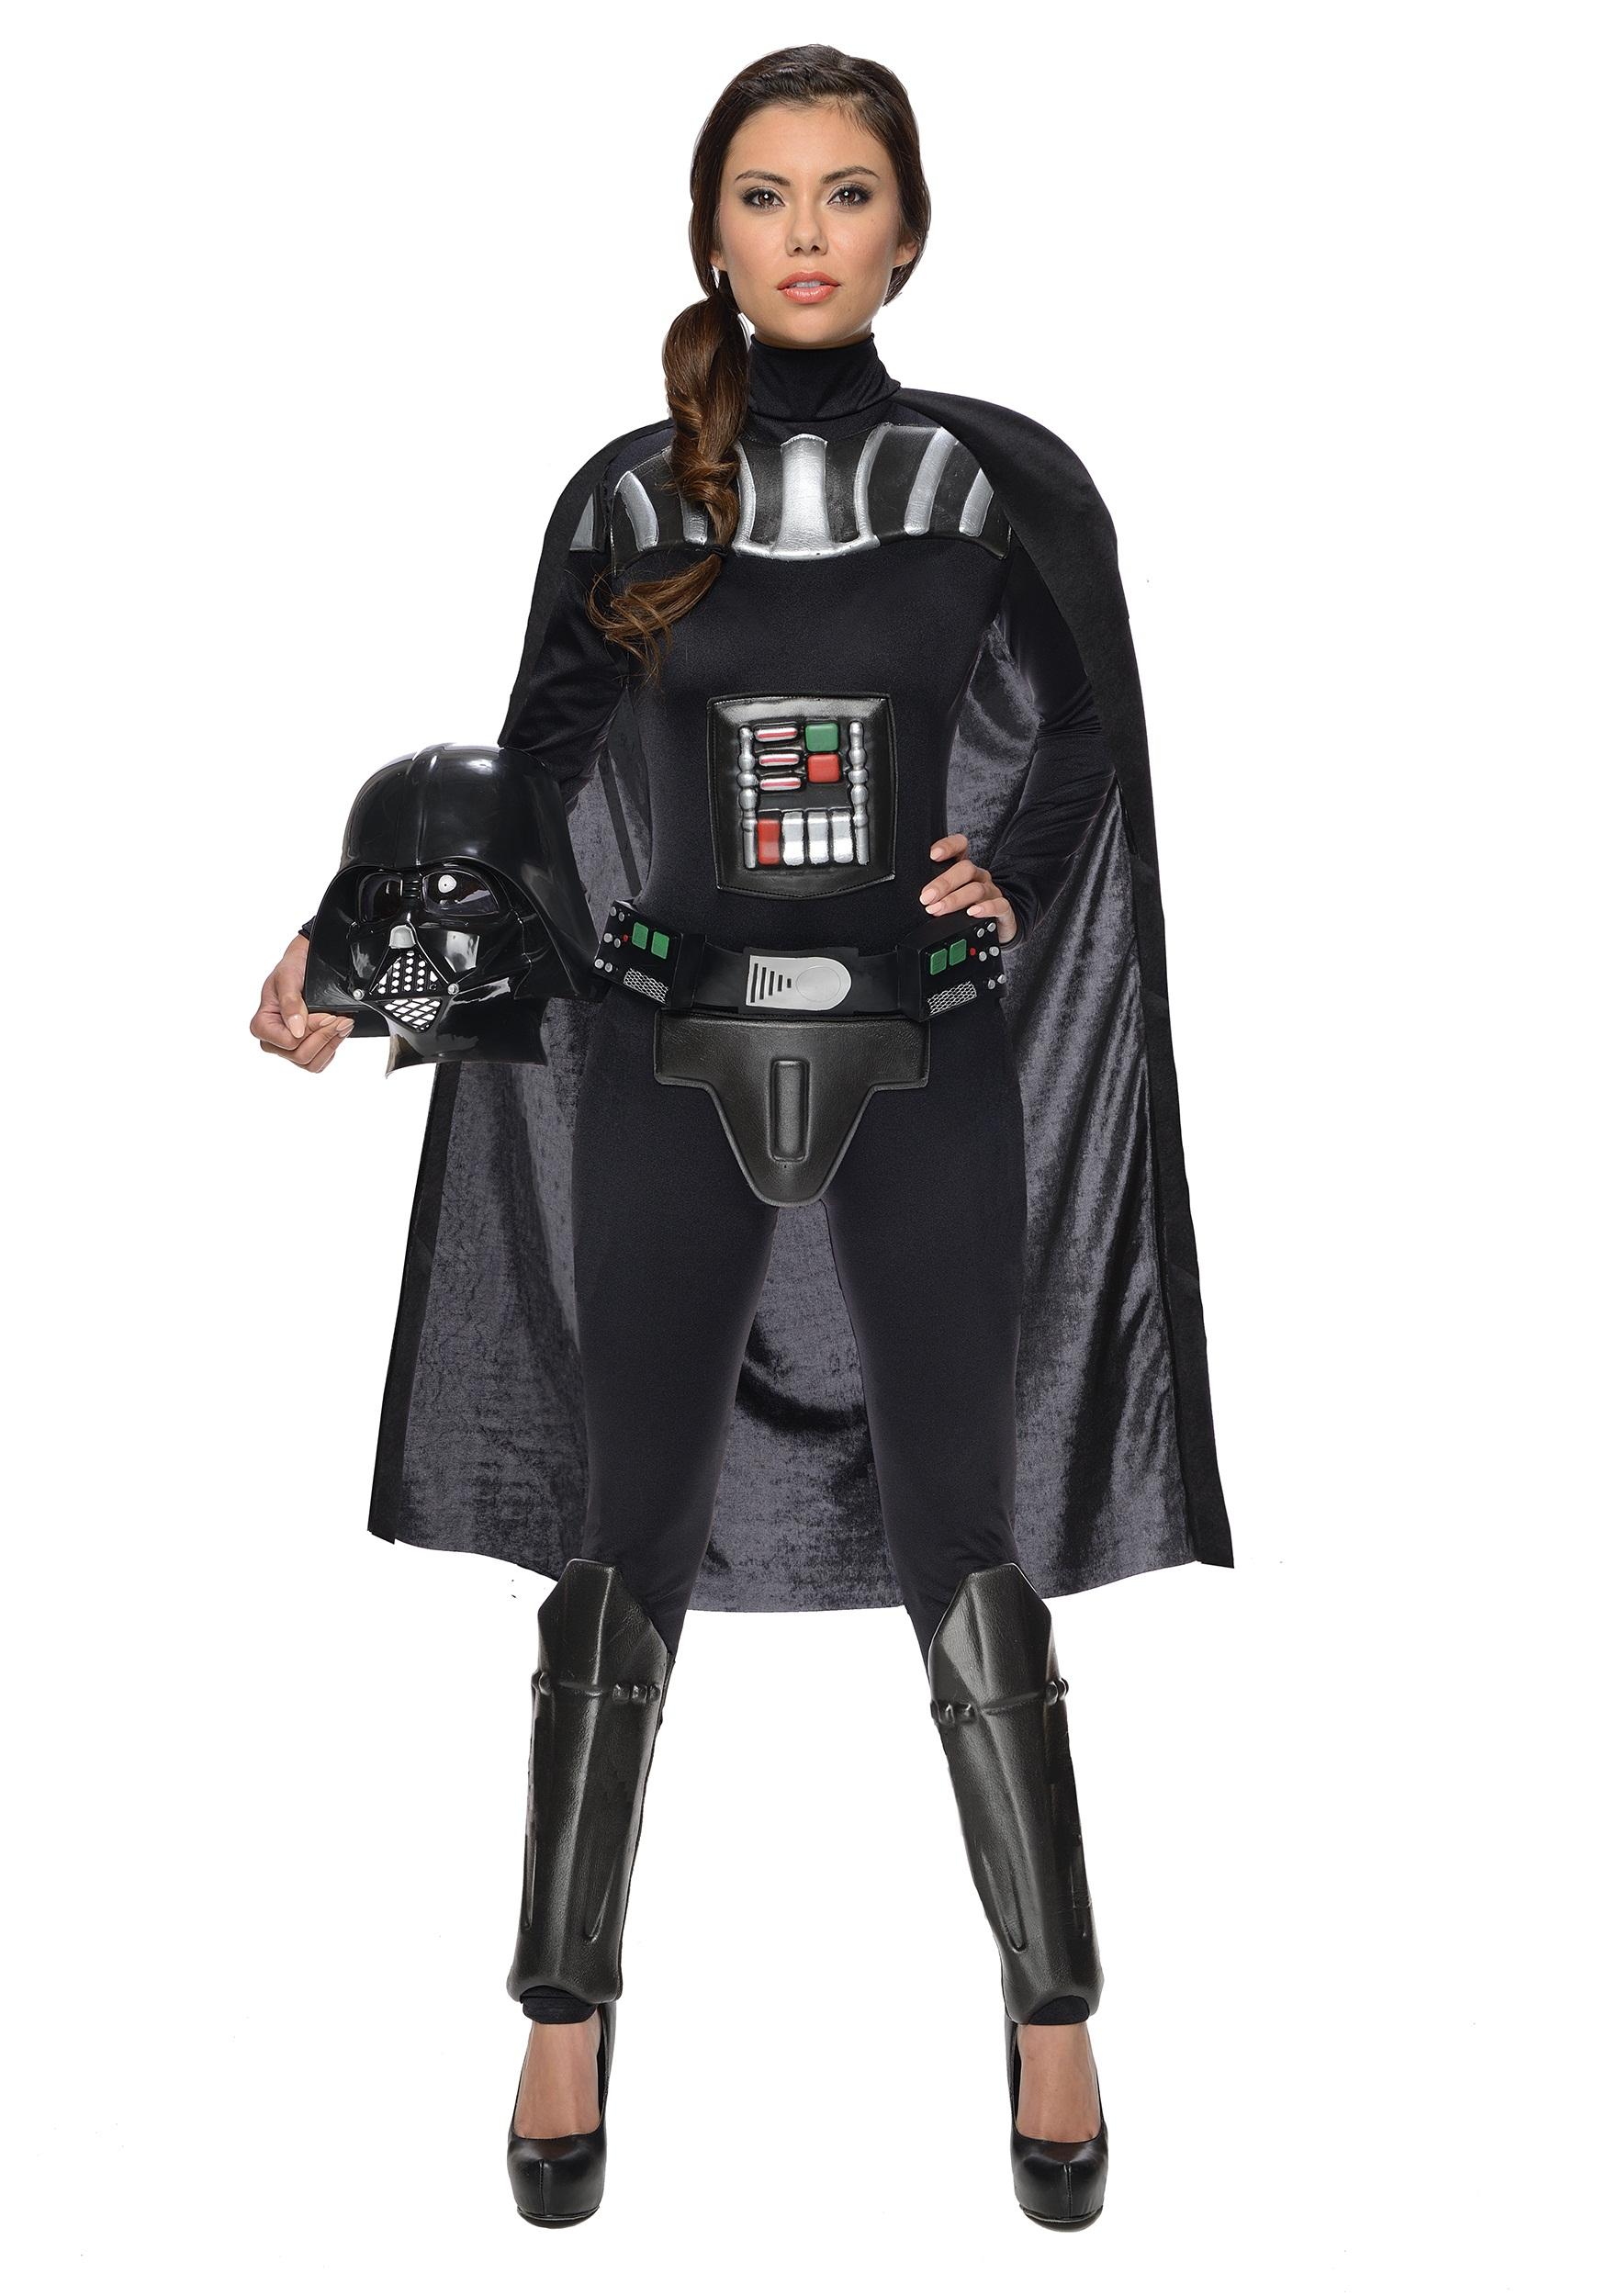 Rousing Star Wars Female Darth Vader Bodysuit Darth Vader Costume Pieces Darth Vader Costume Diy baby Darth Vader Costume